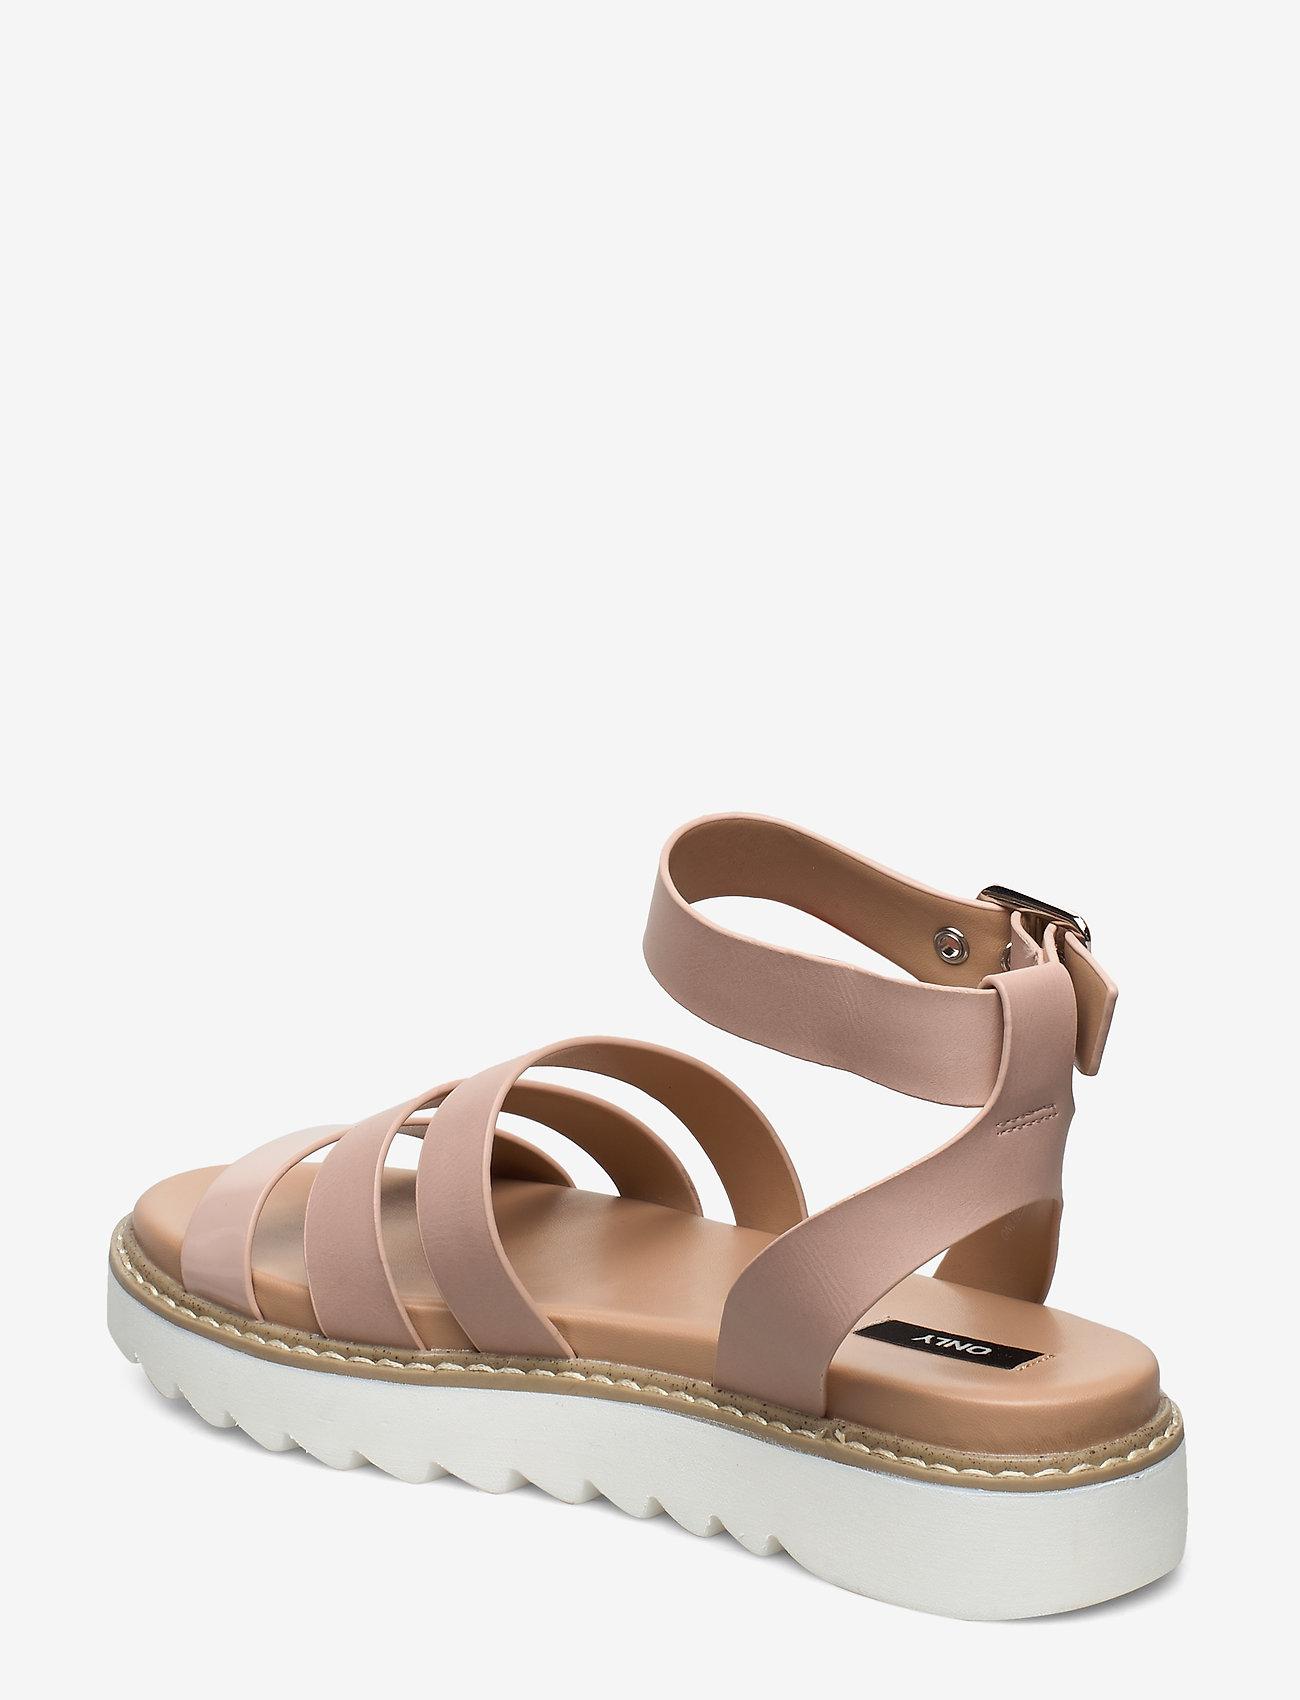 Onlmalu Pu Chunky Wrap Sandal (Nude) - ONLY